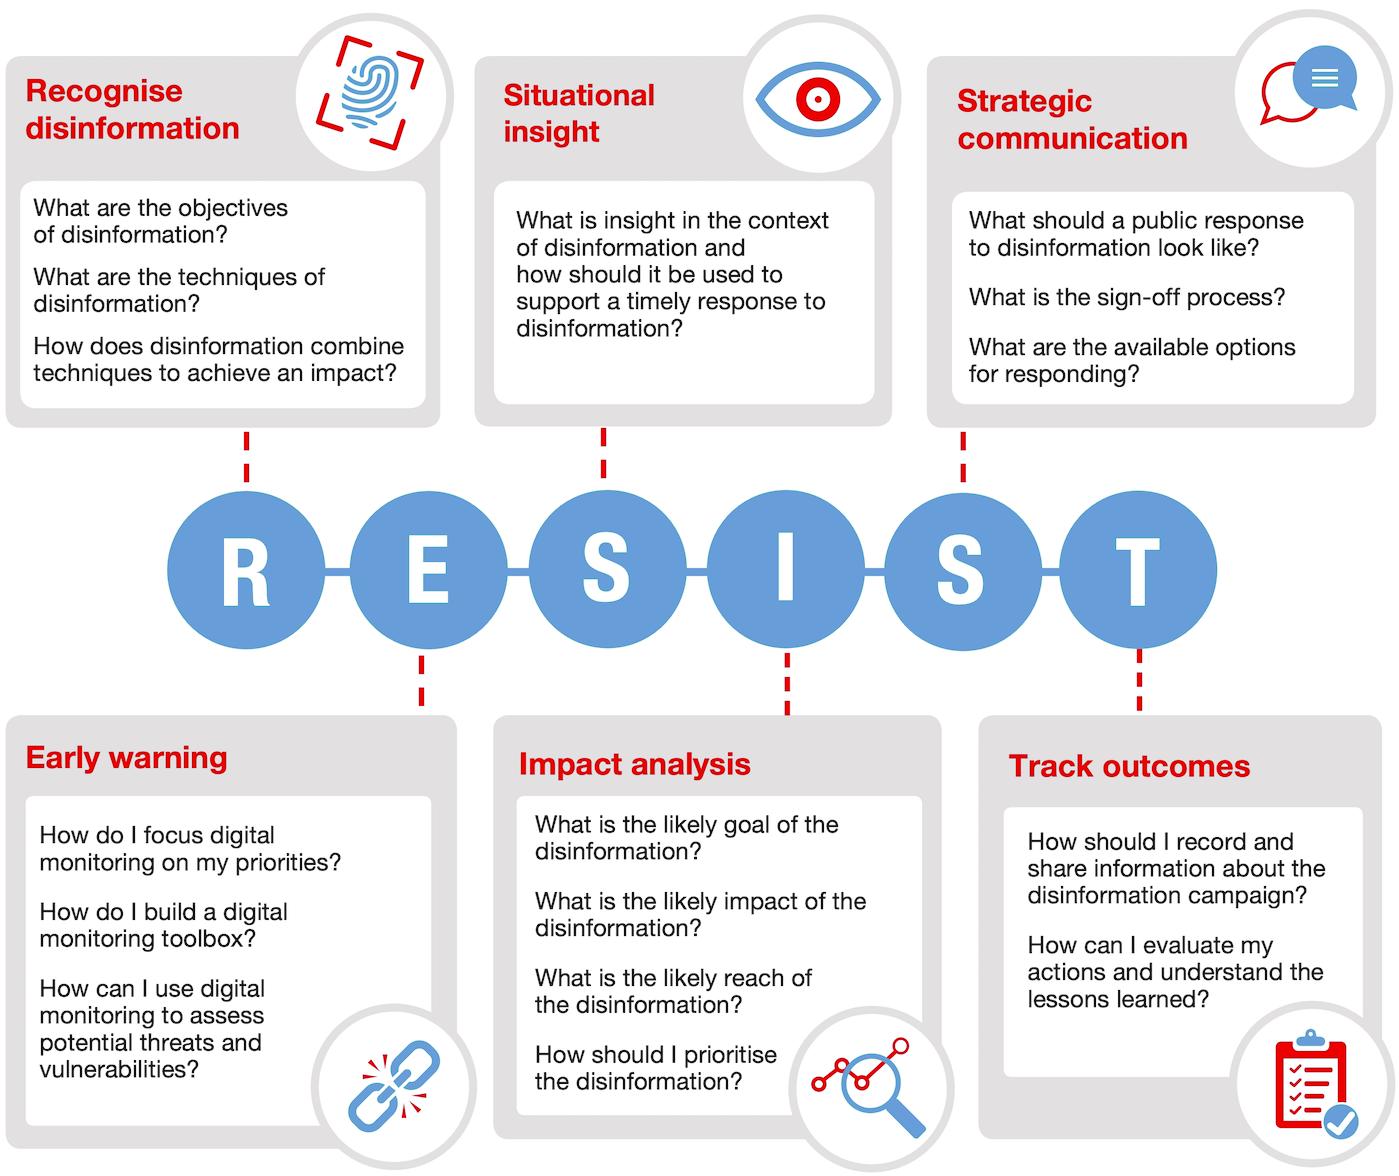 The United Kingdom's 'Resist' framework.